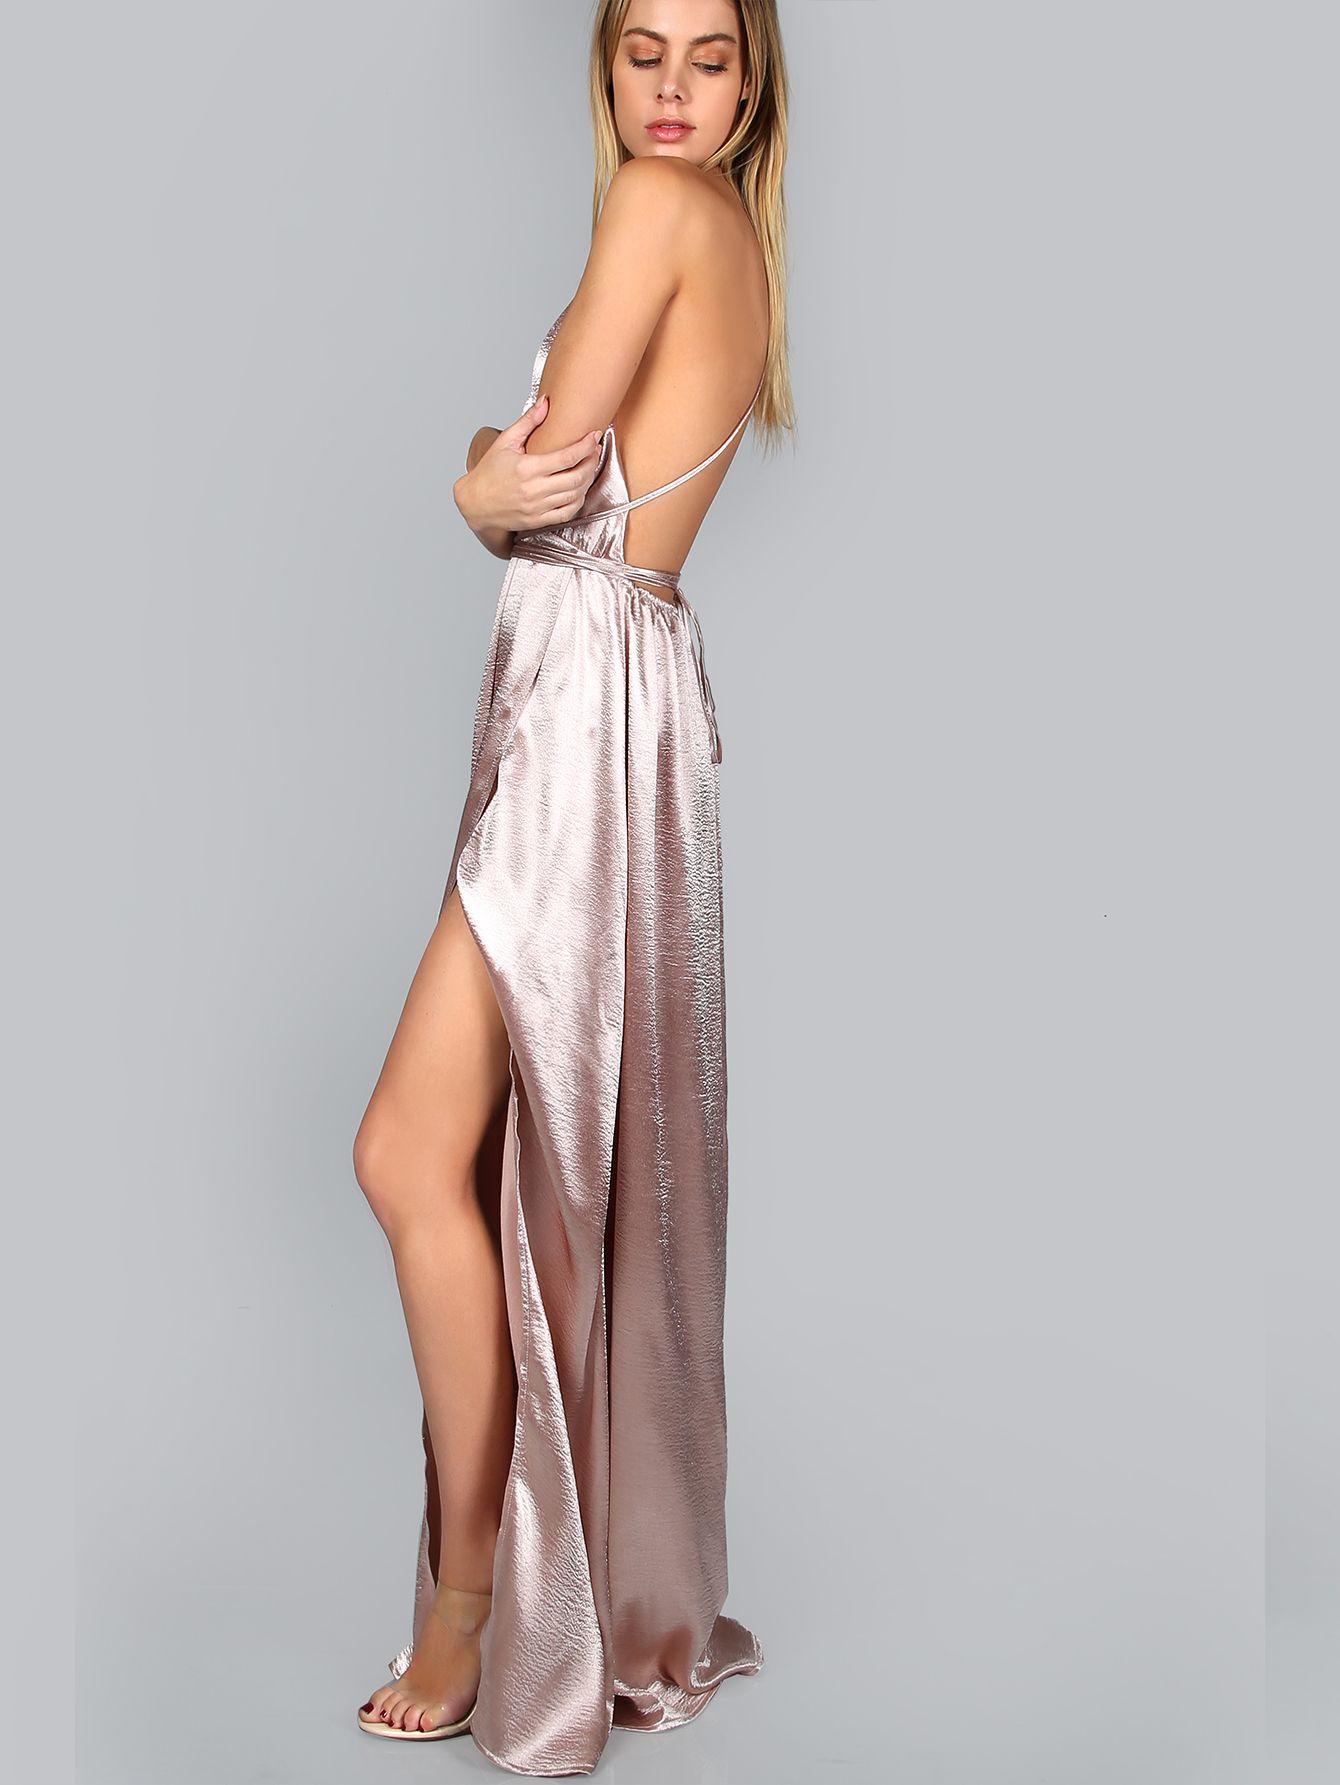 f6018cf3ead Pink Plunge Neck Crisscross Back High Slit Wrap Cami Dress -SheIn(Sheinside)